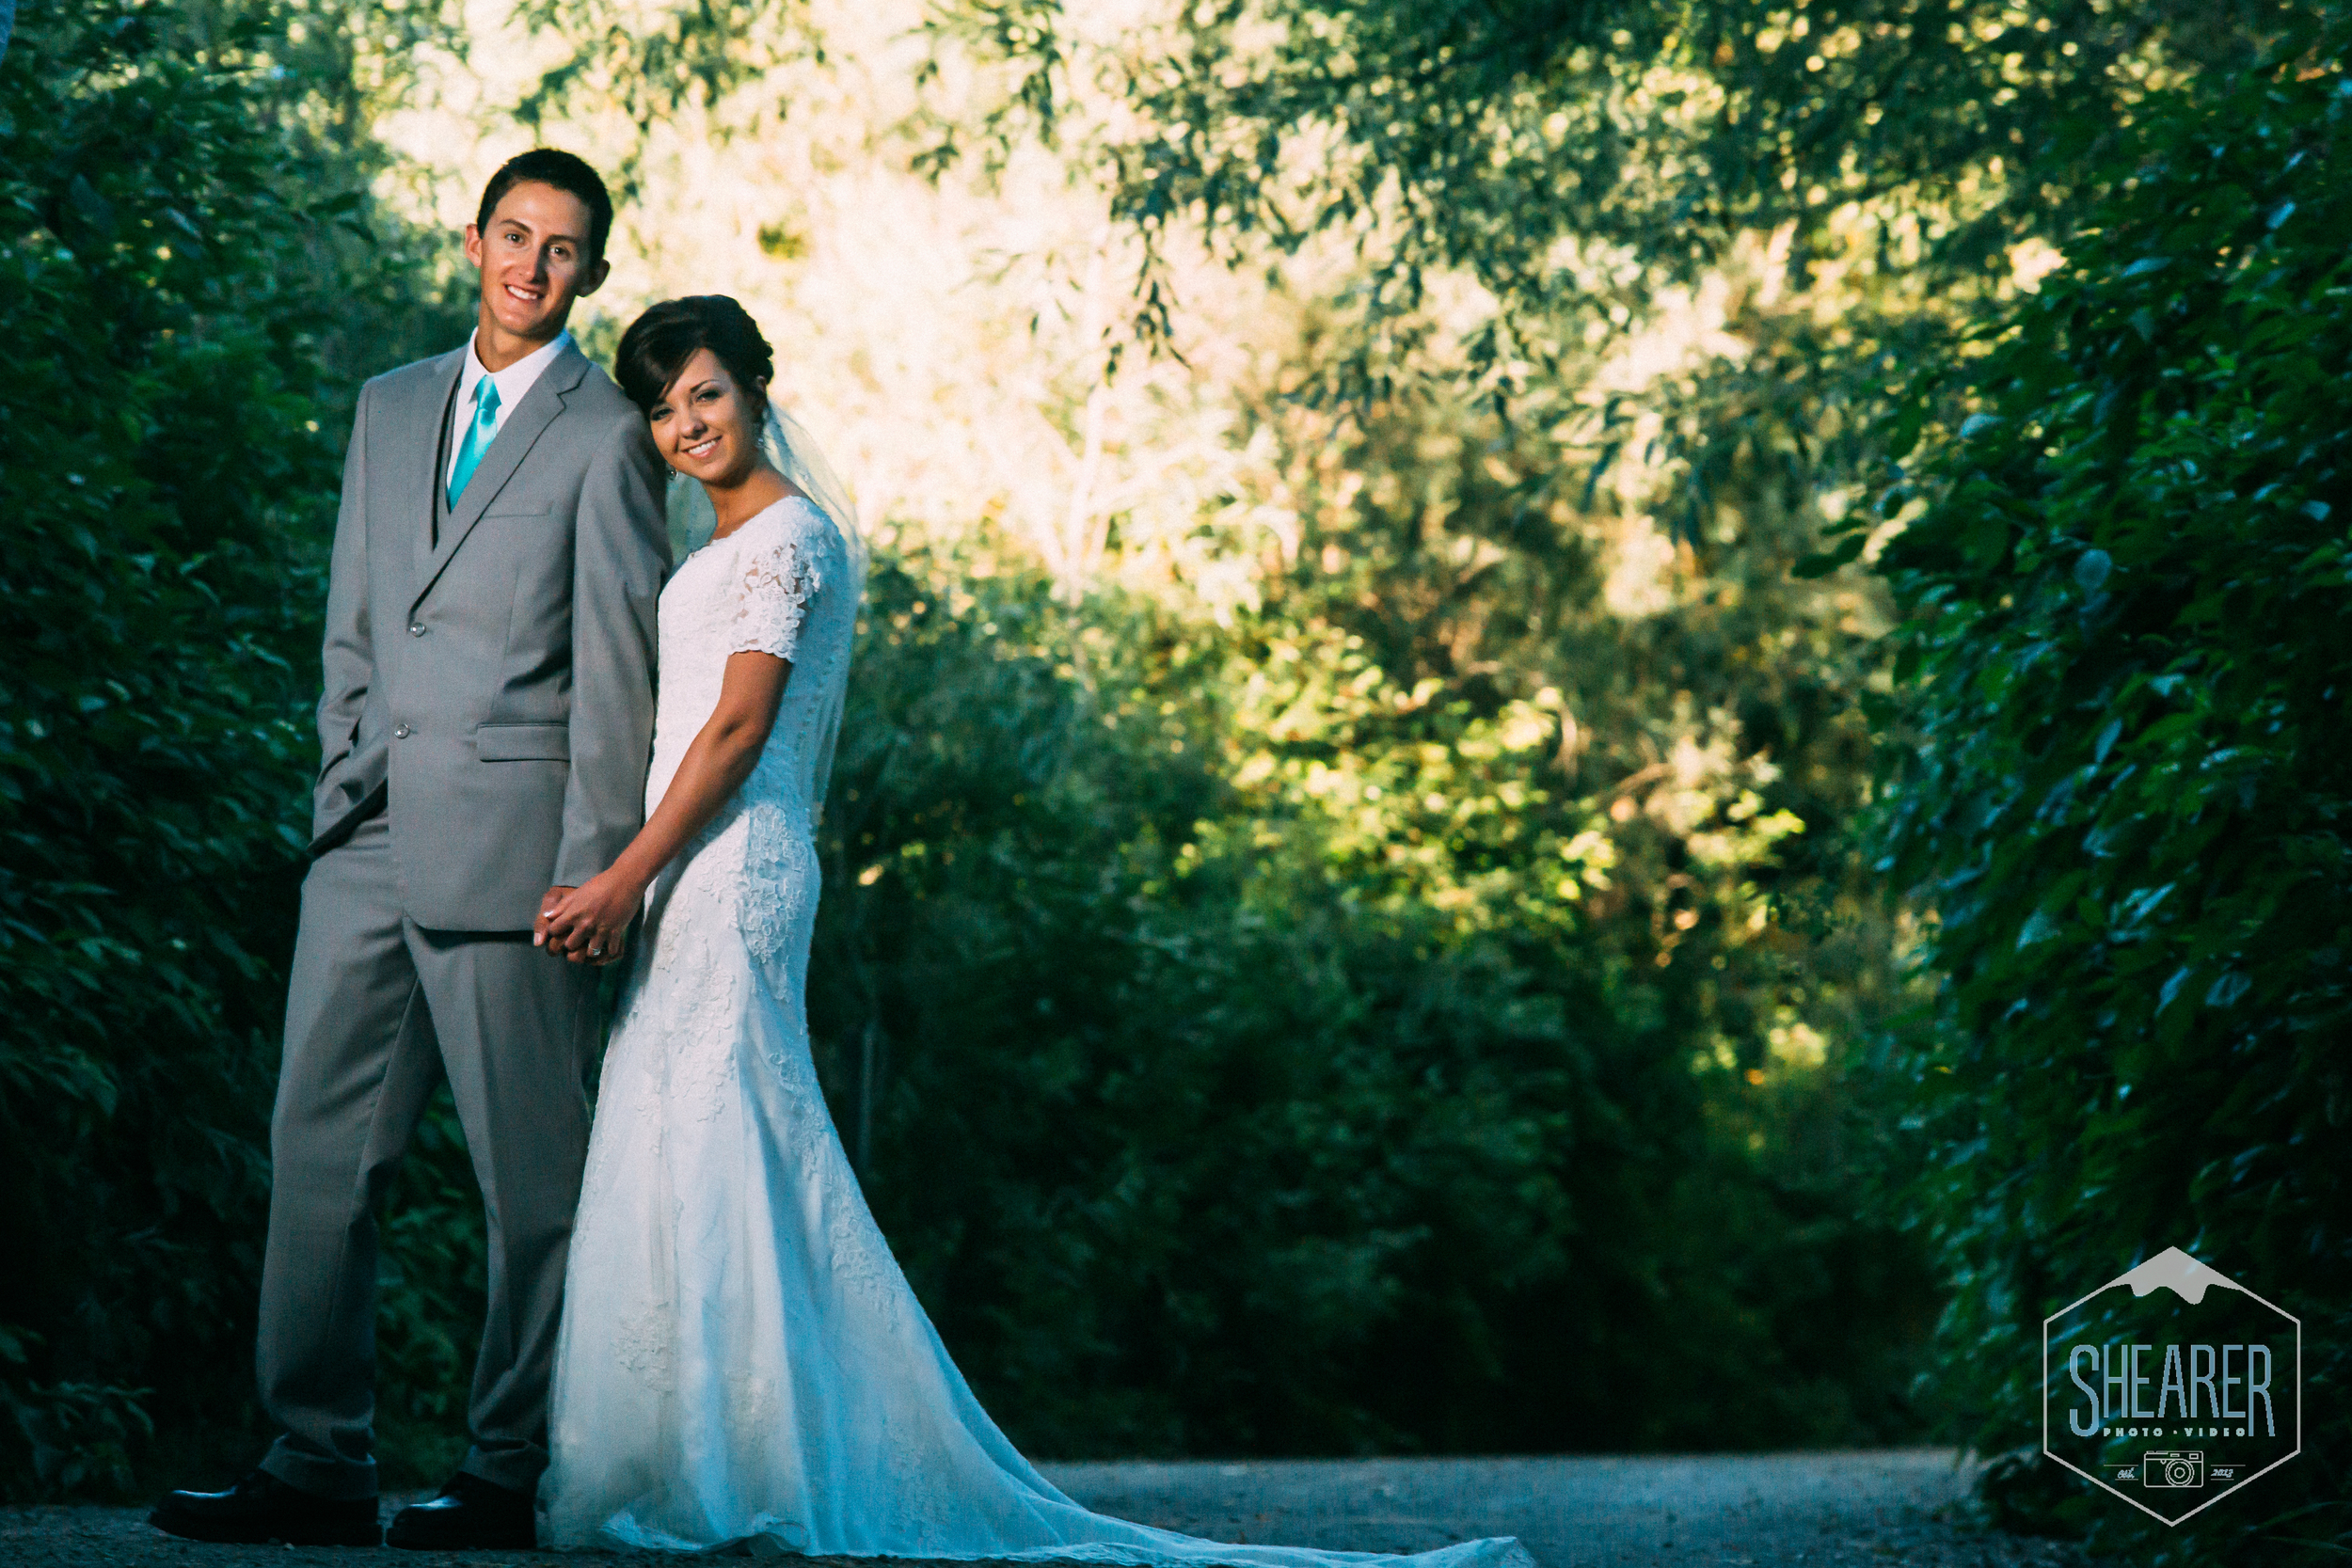 Tyler and Megin Shearer Photo and Video Kayla and Colton bridals wedding rexburg idaho-132.jpg